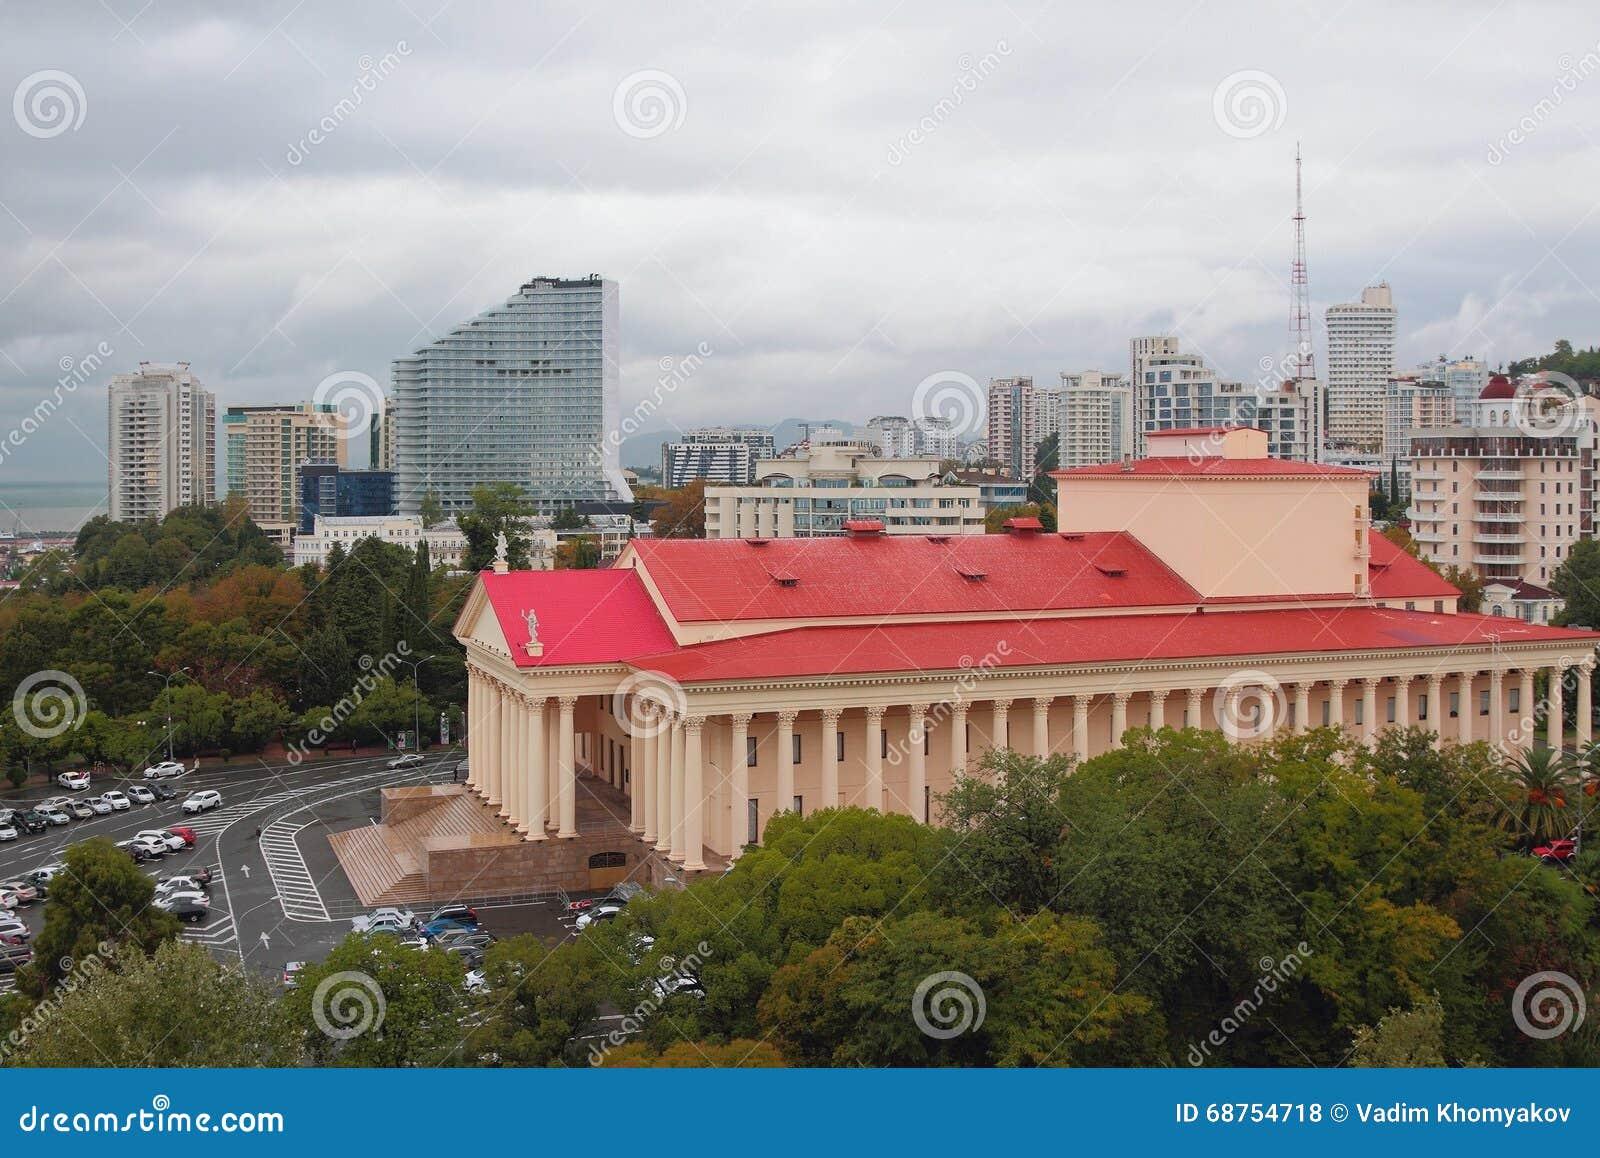 Widok miasto od above 2014 2018 filiżanki gier olimpijski Russia Sochi zima świat